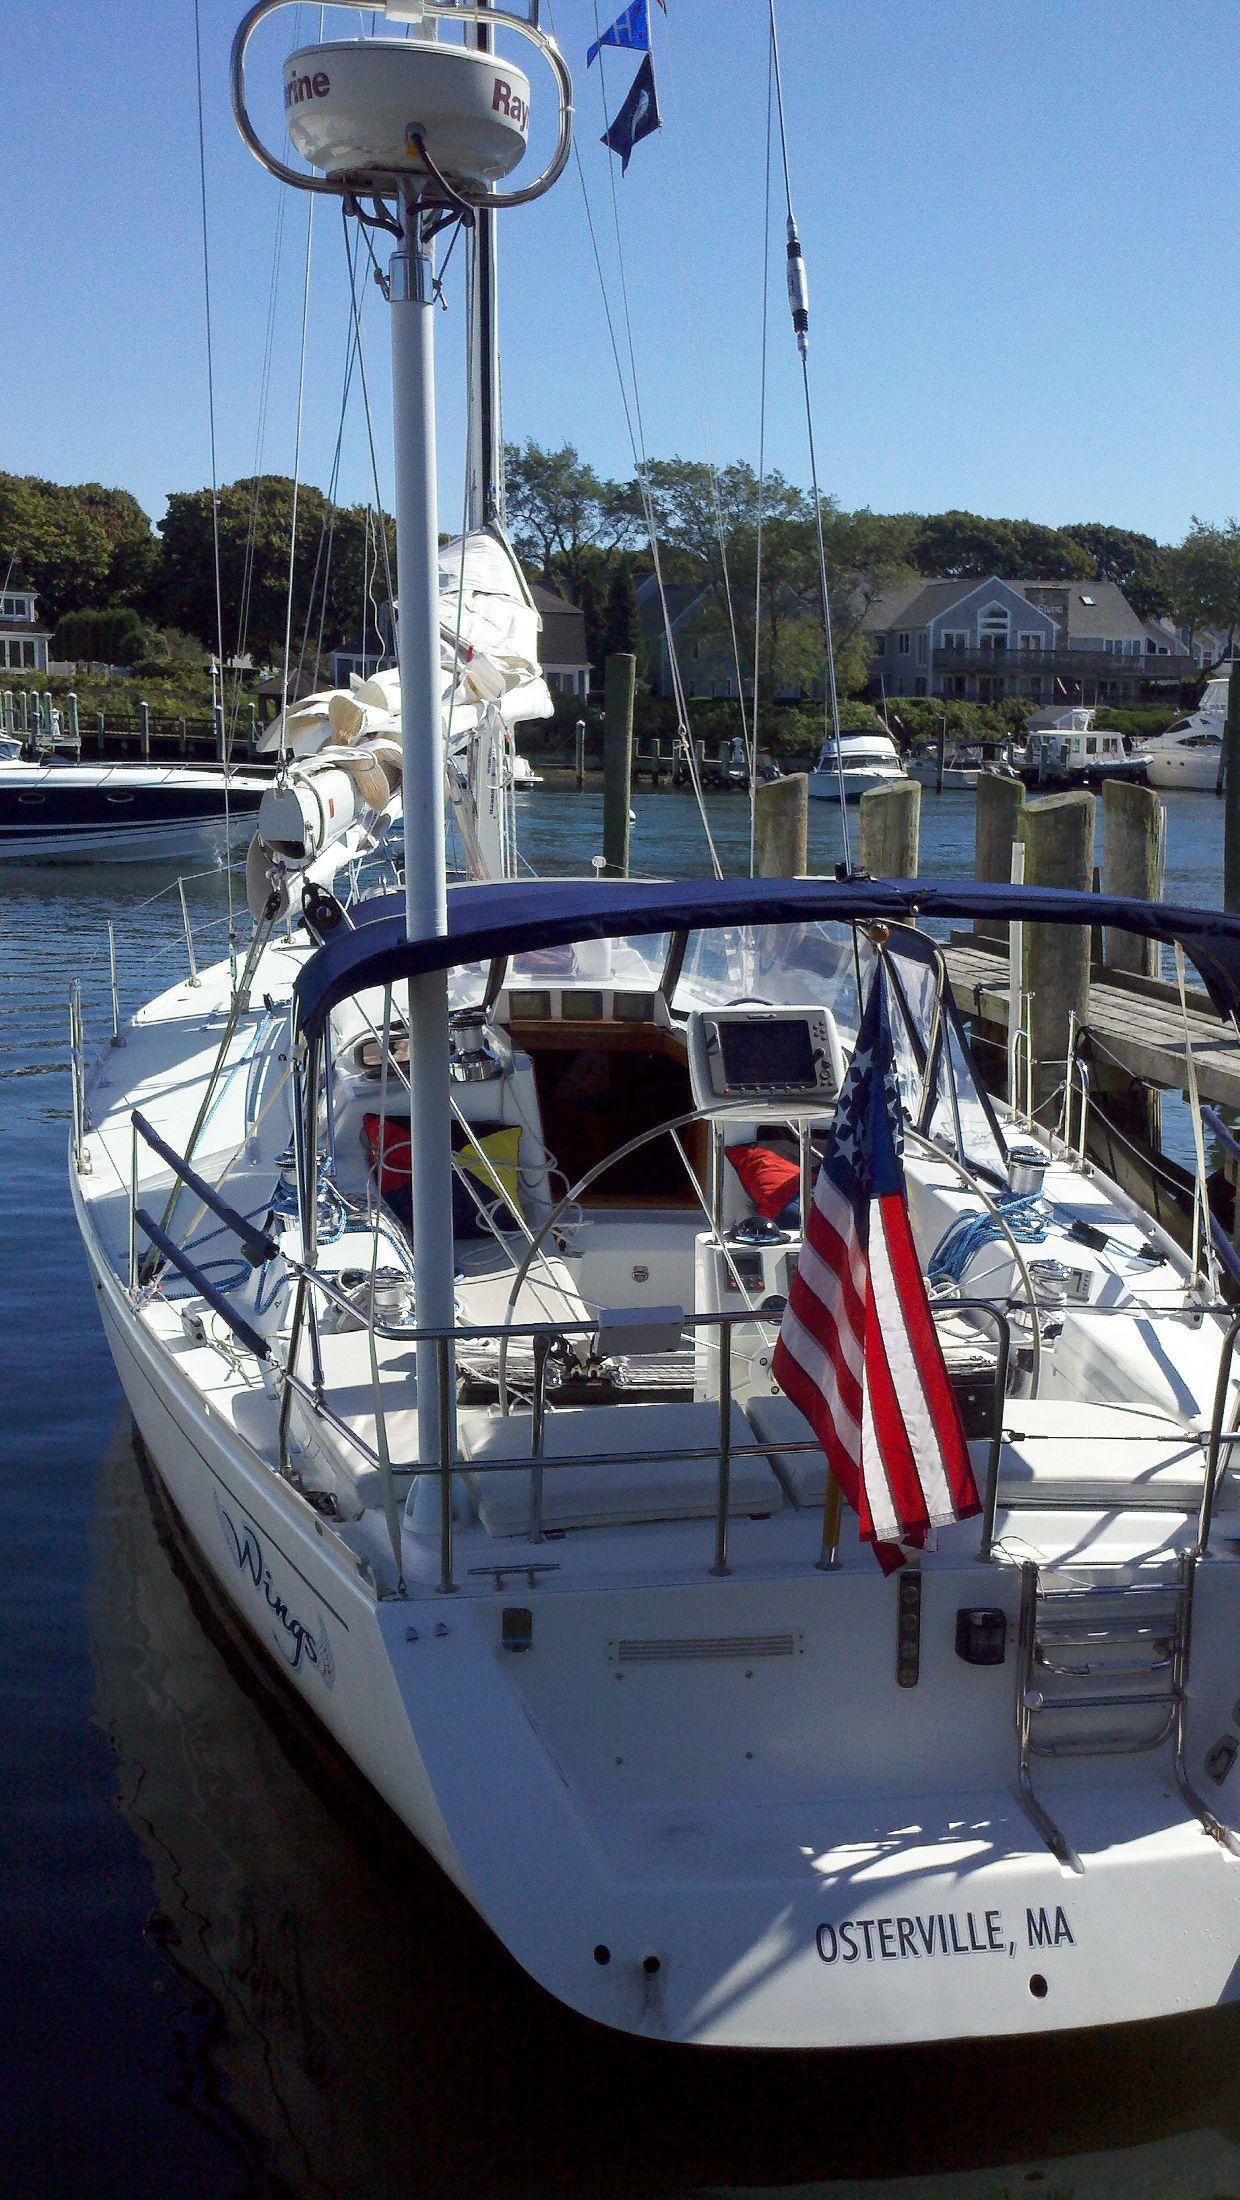 3718729_2_20110923102837_1_0 j boats crosby yachts